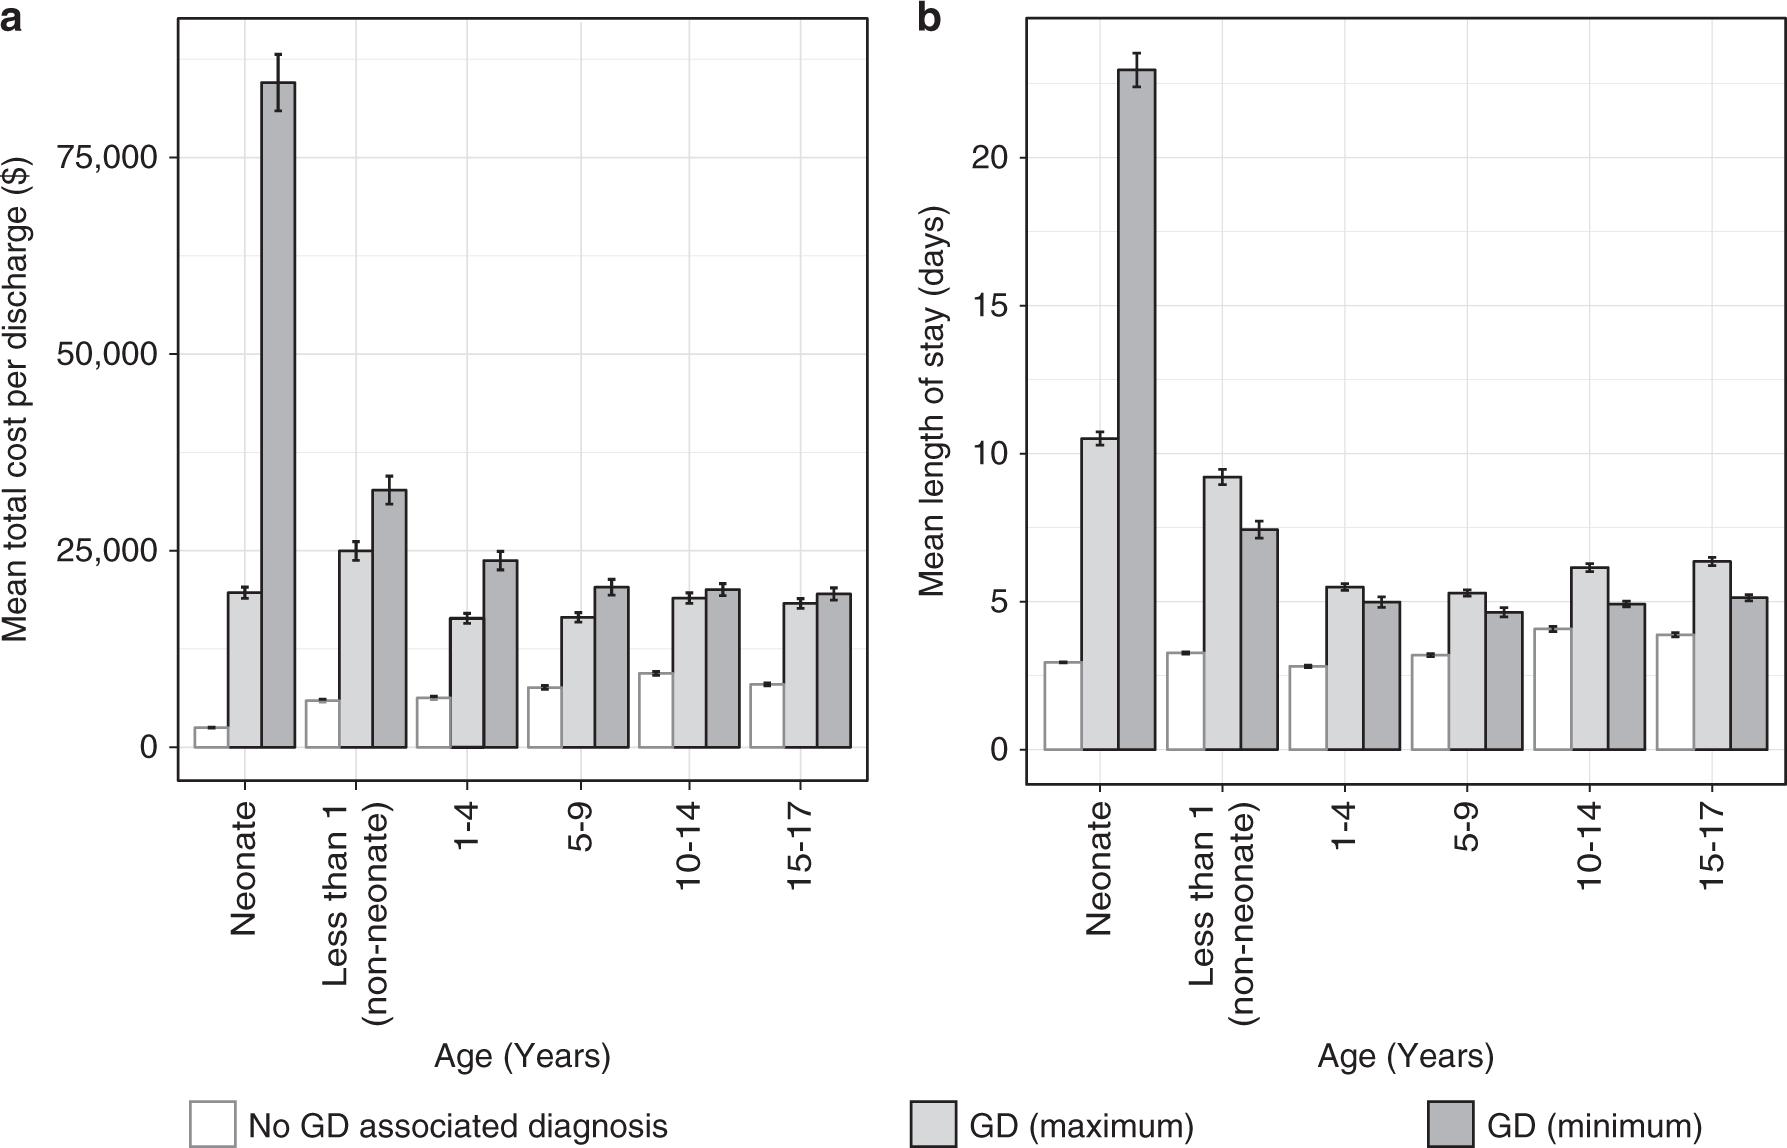 Autisms Costs To Us Economy Estimated >> Estimating The Burden And Economic Impact Of Pediatric Genetic